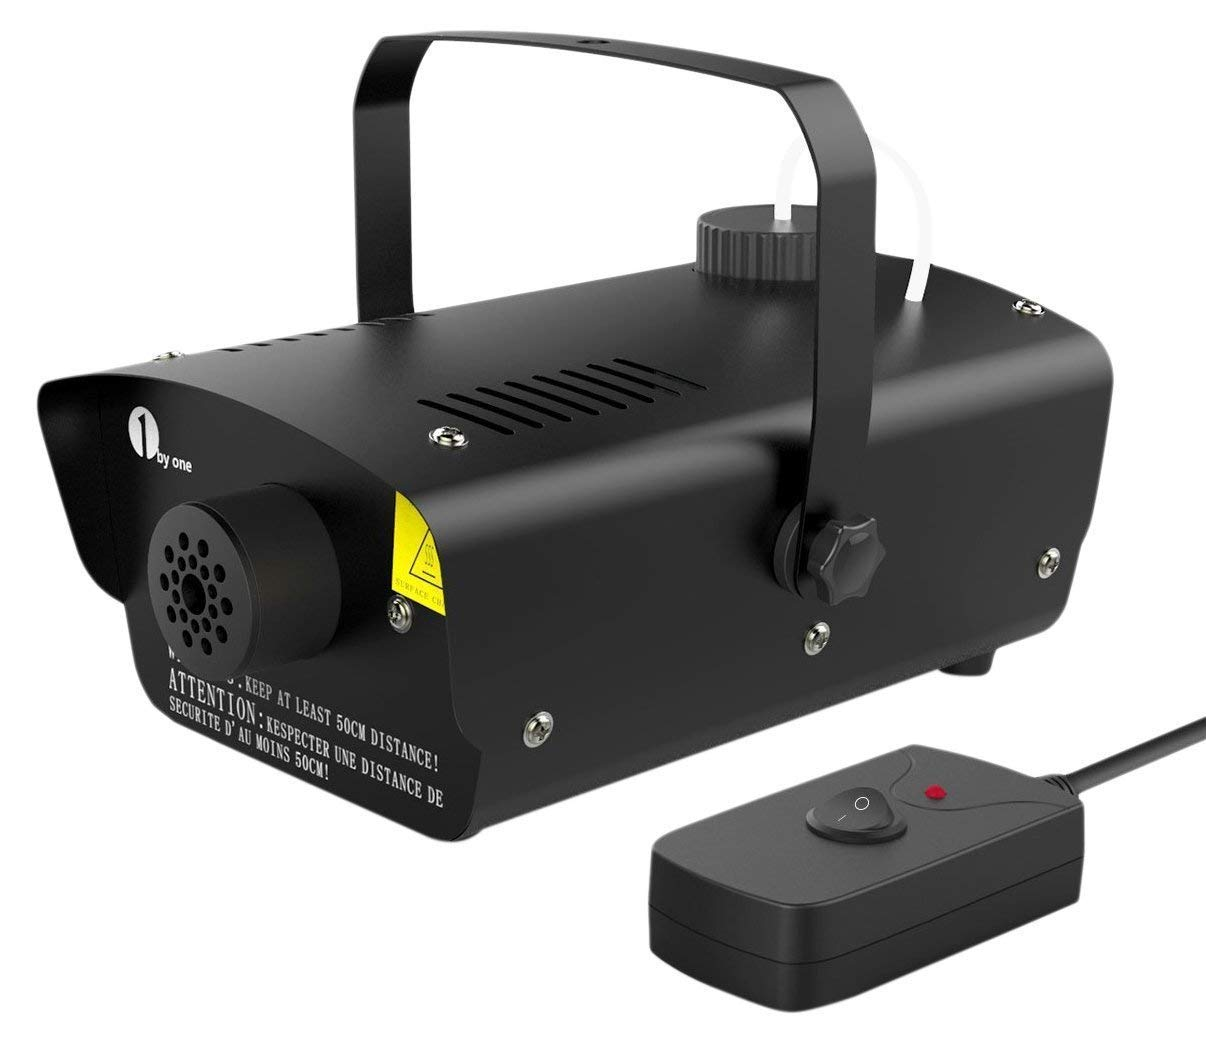 1byone Halloween Fog Machine with Wired Remote Control, 400-Watt Smoke Machine for Holidays, Parties, Weddings, Black